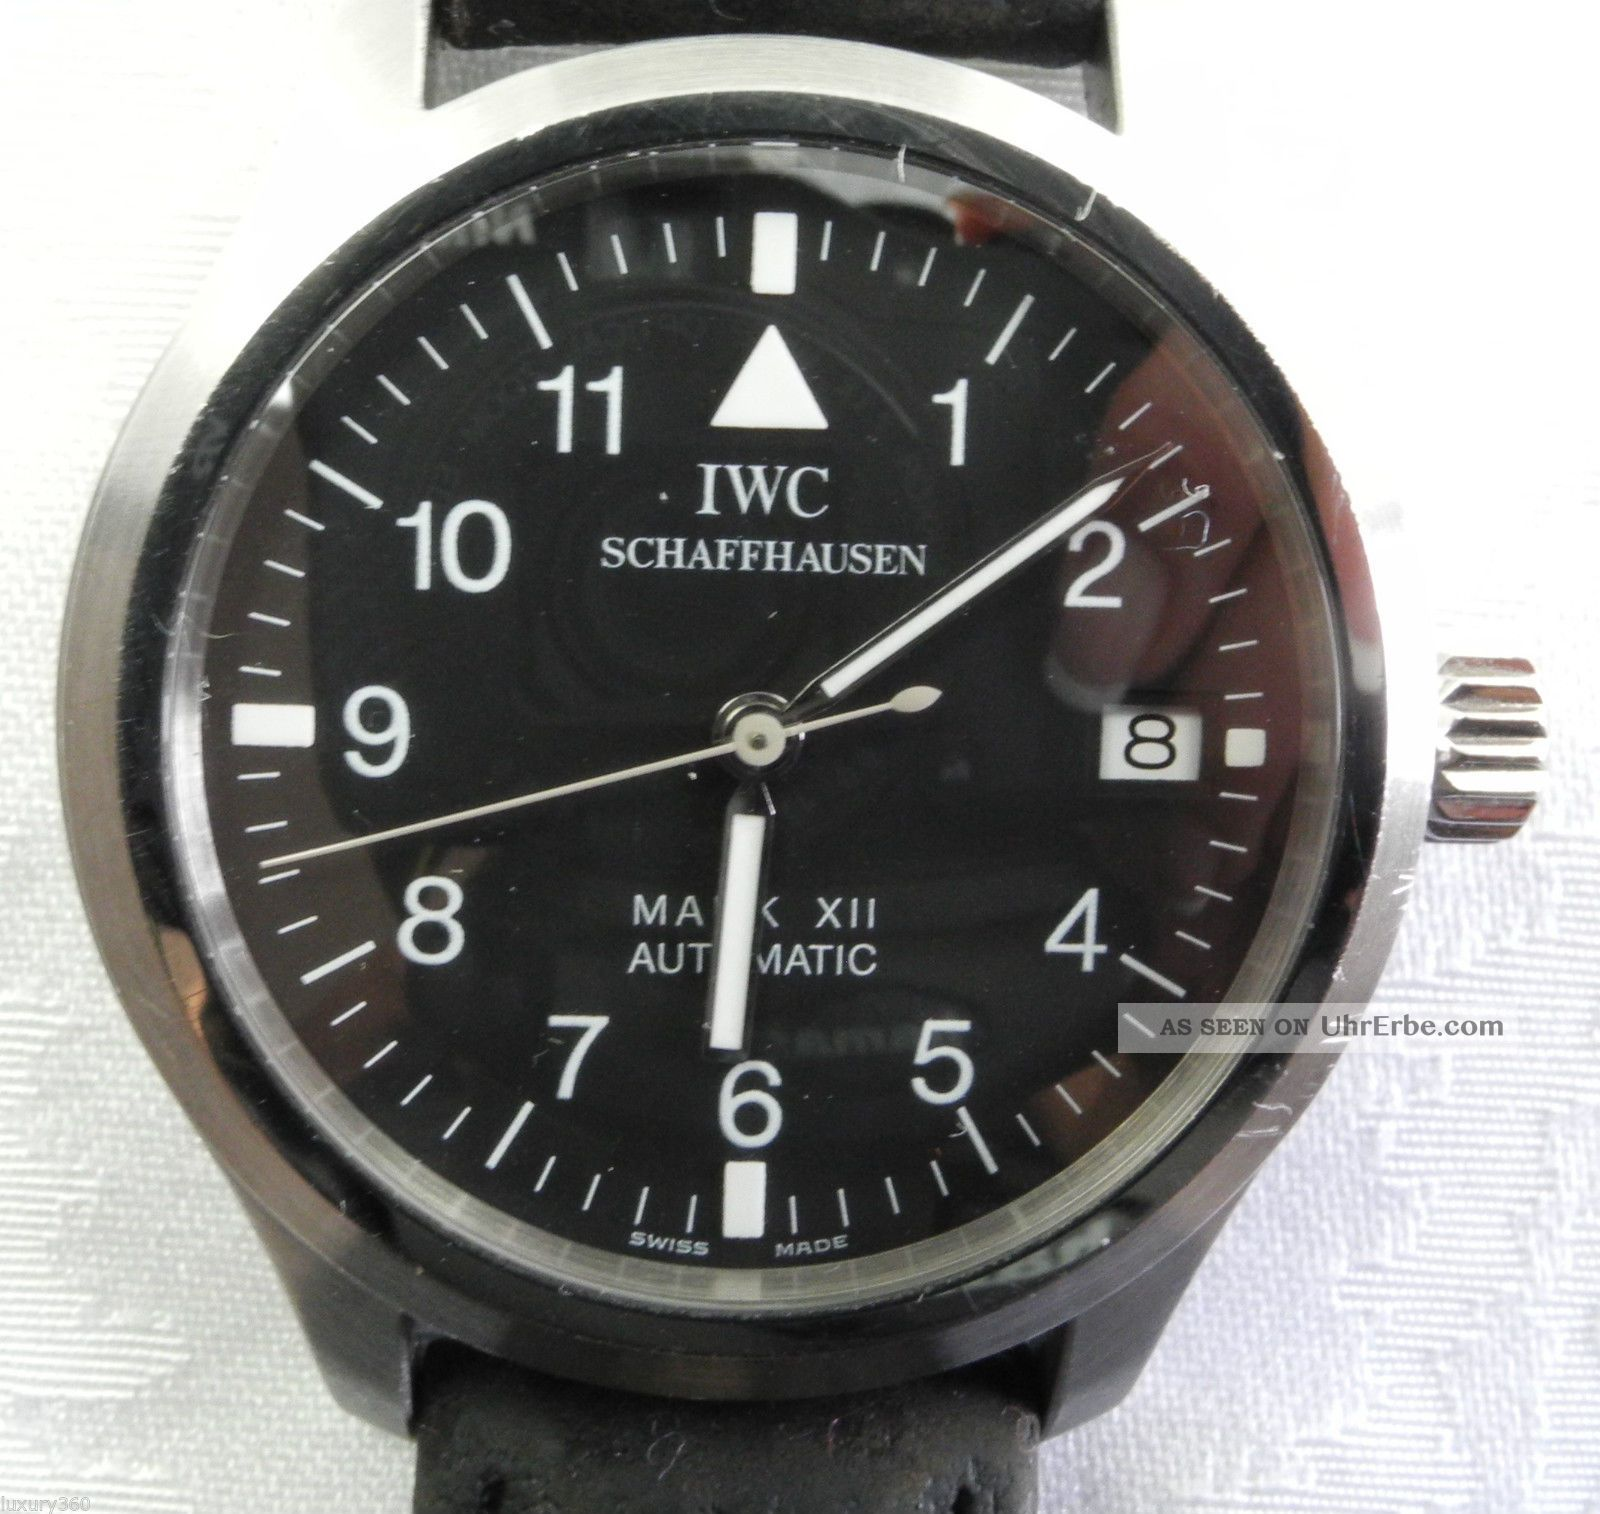 Iwc Schaffhausen Mark Xii Automatic Fliegeruhr Armbanduhren Bild